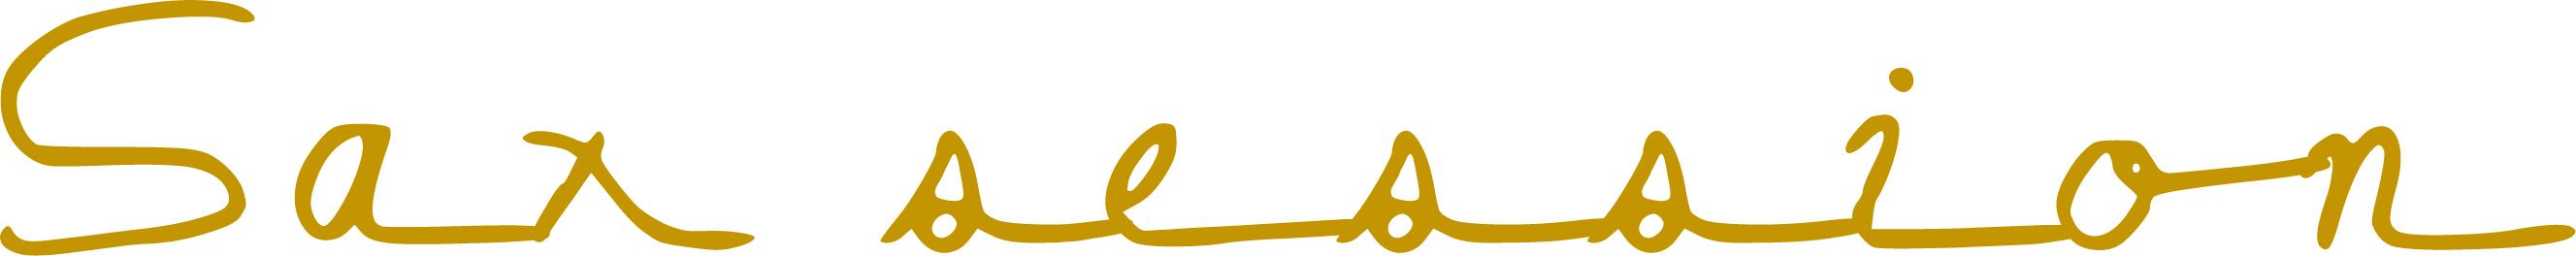 http://saxsession.de/wp-content/uploads/2016/04/Logo_saxsession.jpg